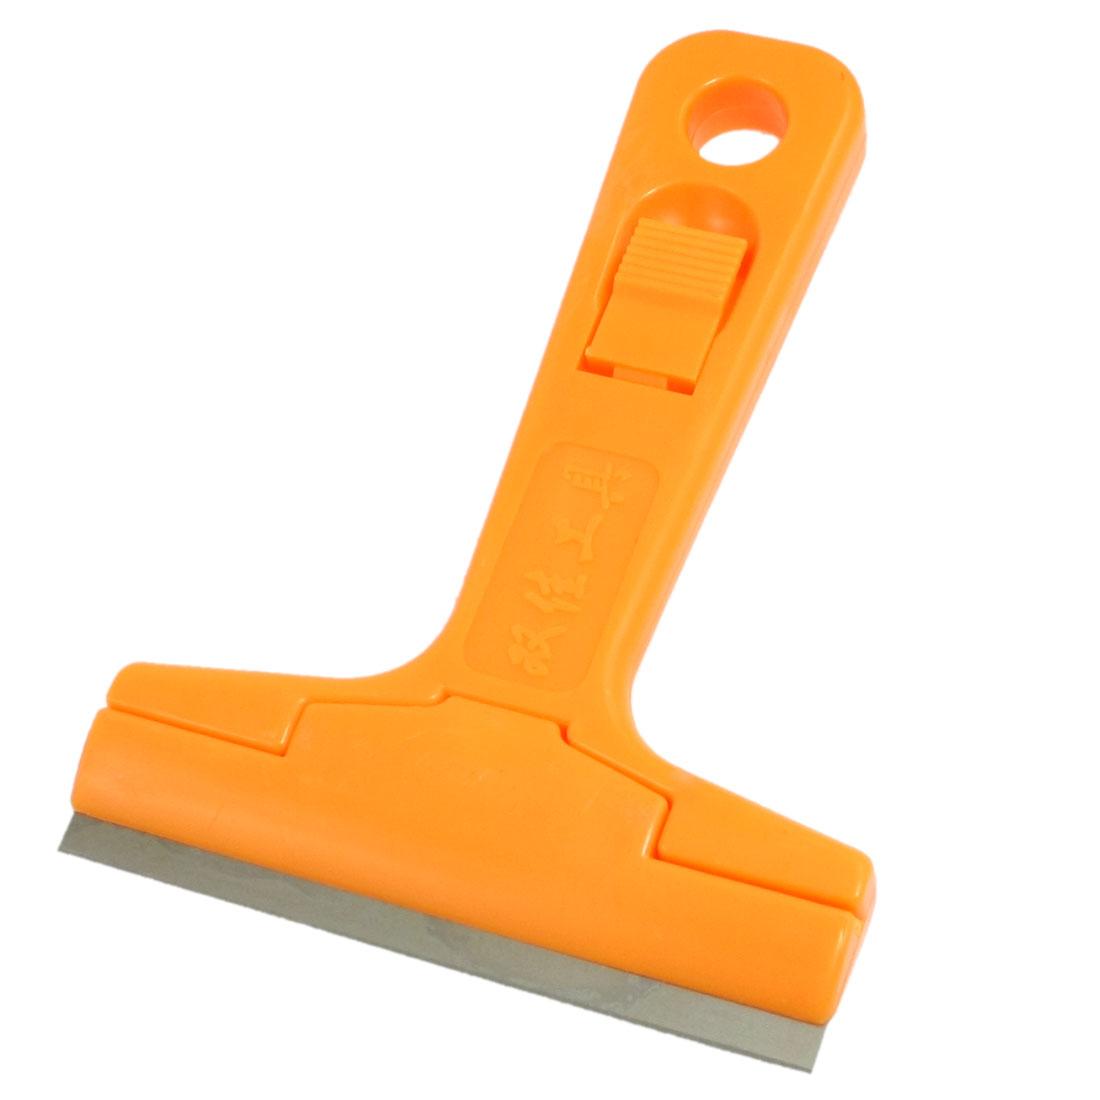 Antislip Plastic Handle Household Floor Wall Paint Scraper Orange